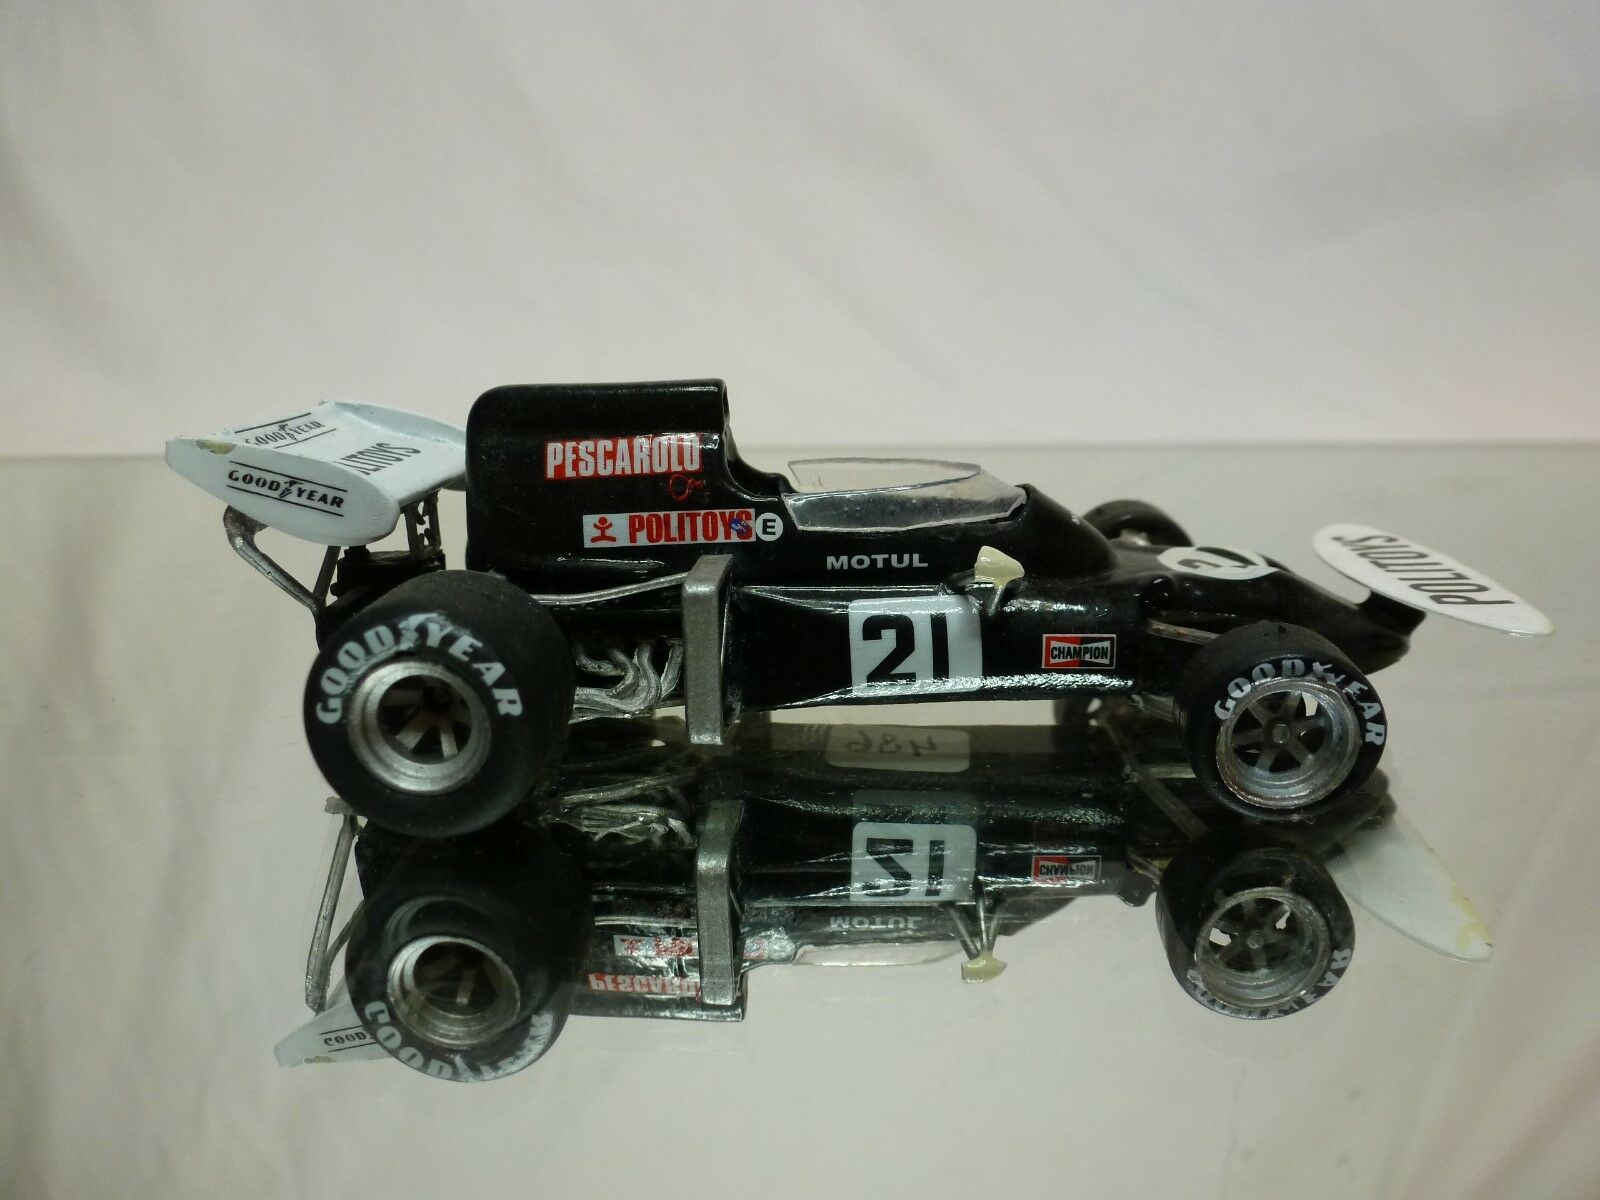 KIT (built) (built) (built) - formule 1 car 1972 henri pescarolo POLITOYS 1 43  NICE CONDITION 74c5b7